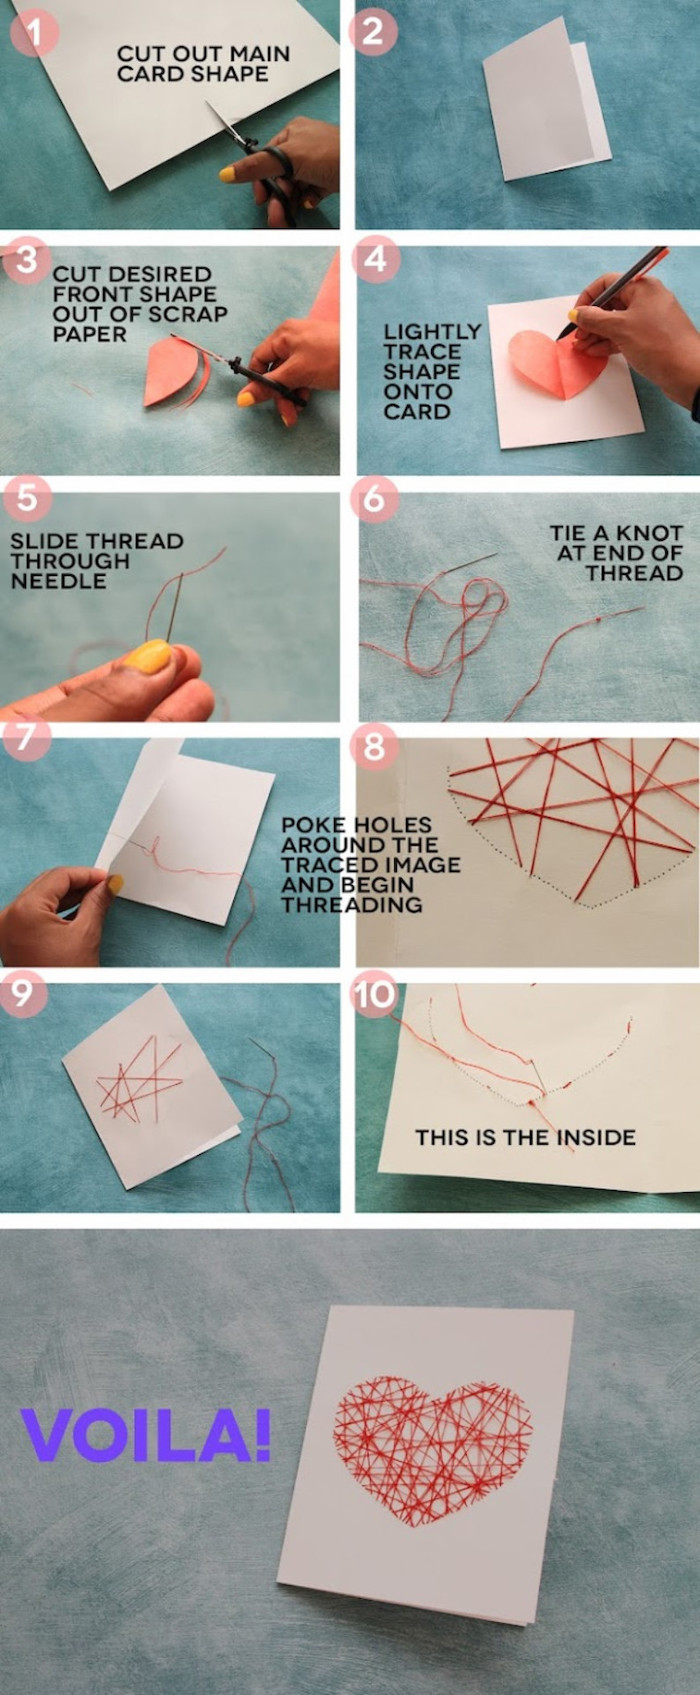 handmade paper card, hand-sewn heart, gift basket ideas for boyfriend